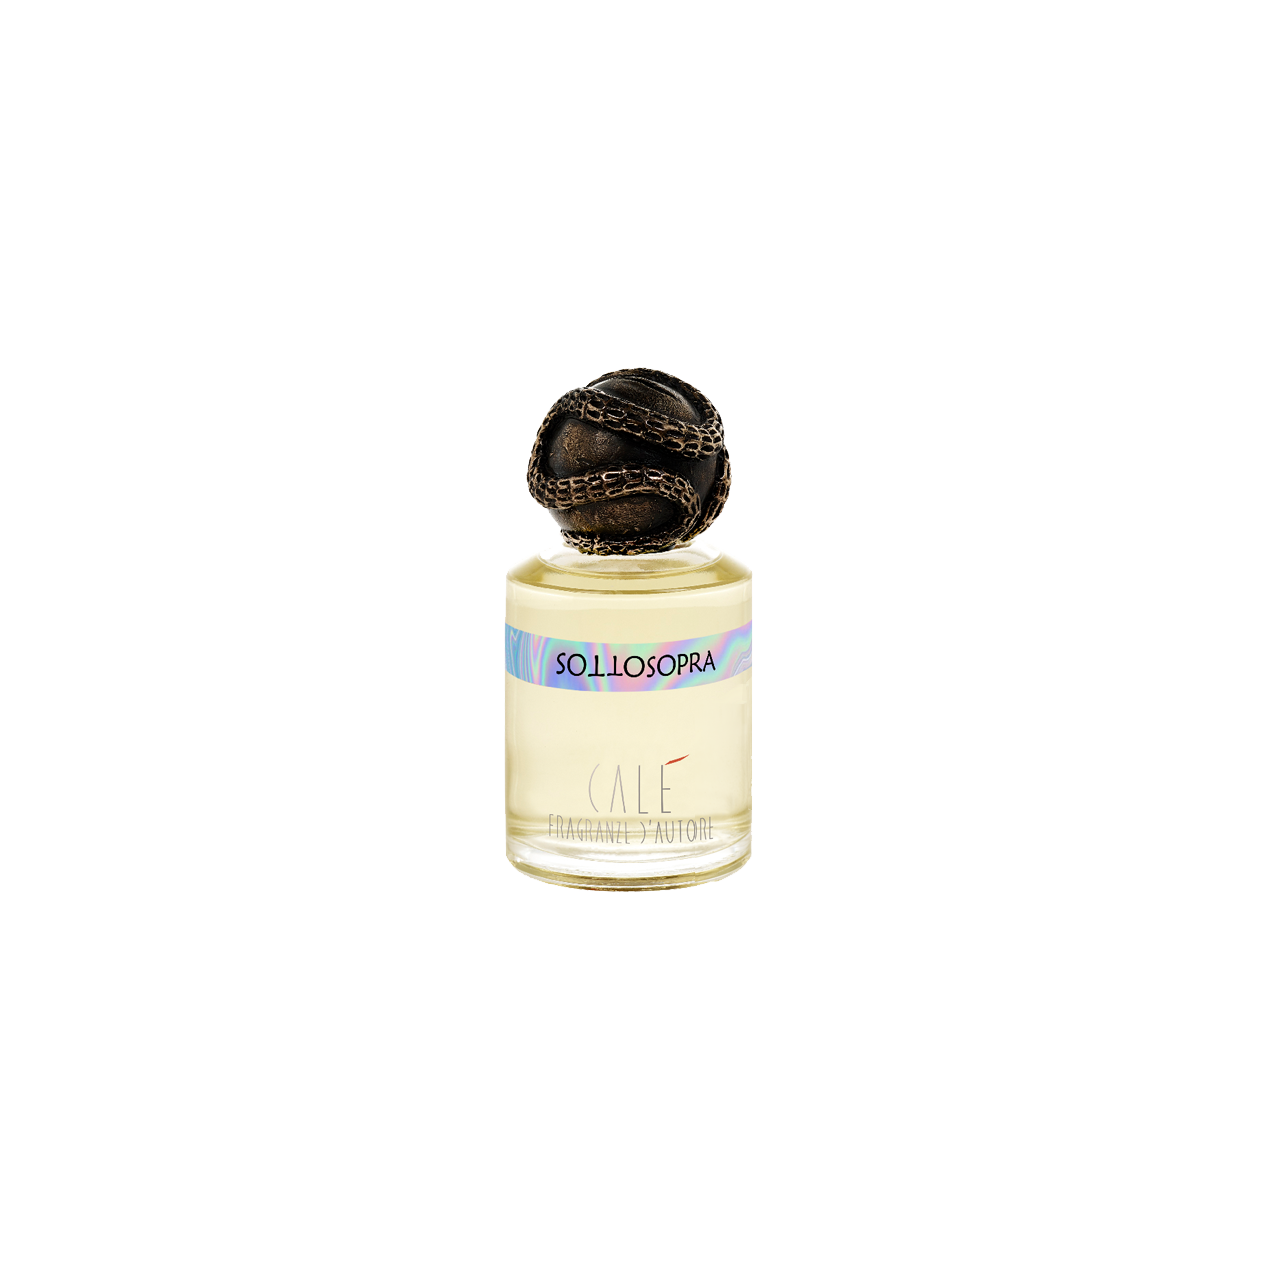 Sottosopra Edizione Numerata - Eau de Parfum